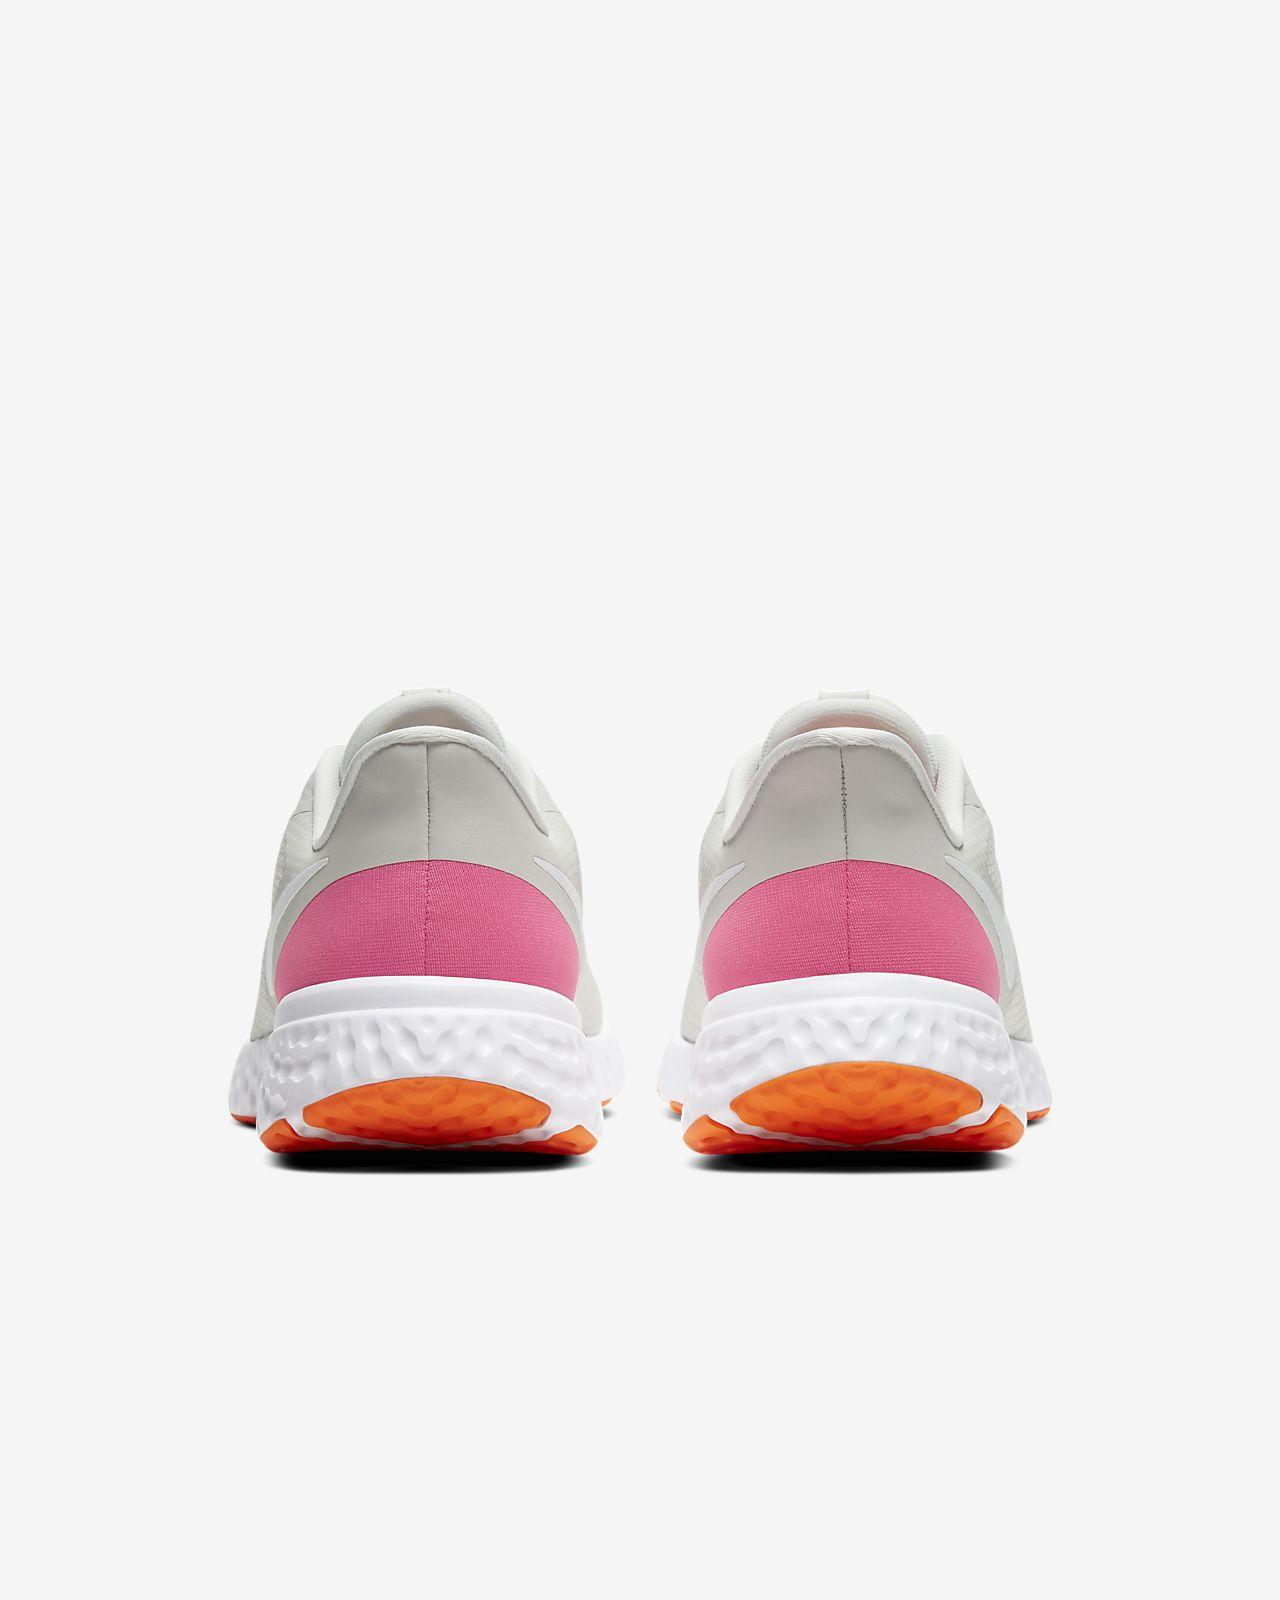 womens nike revolution 3 orange white pink size 7 wide